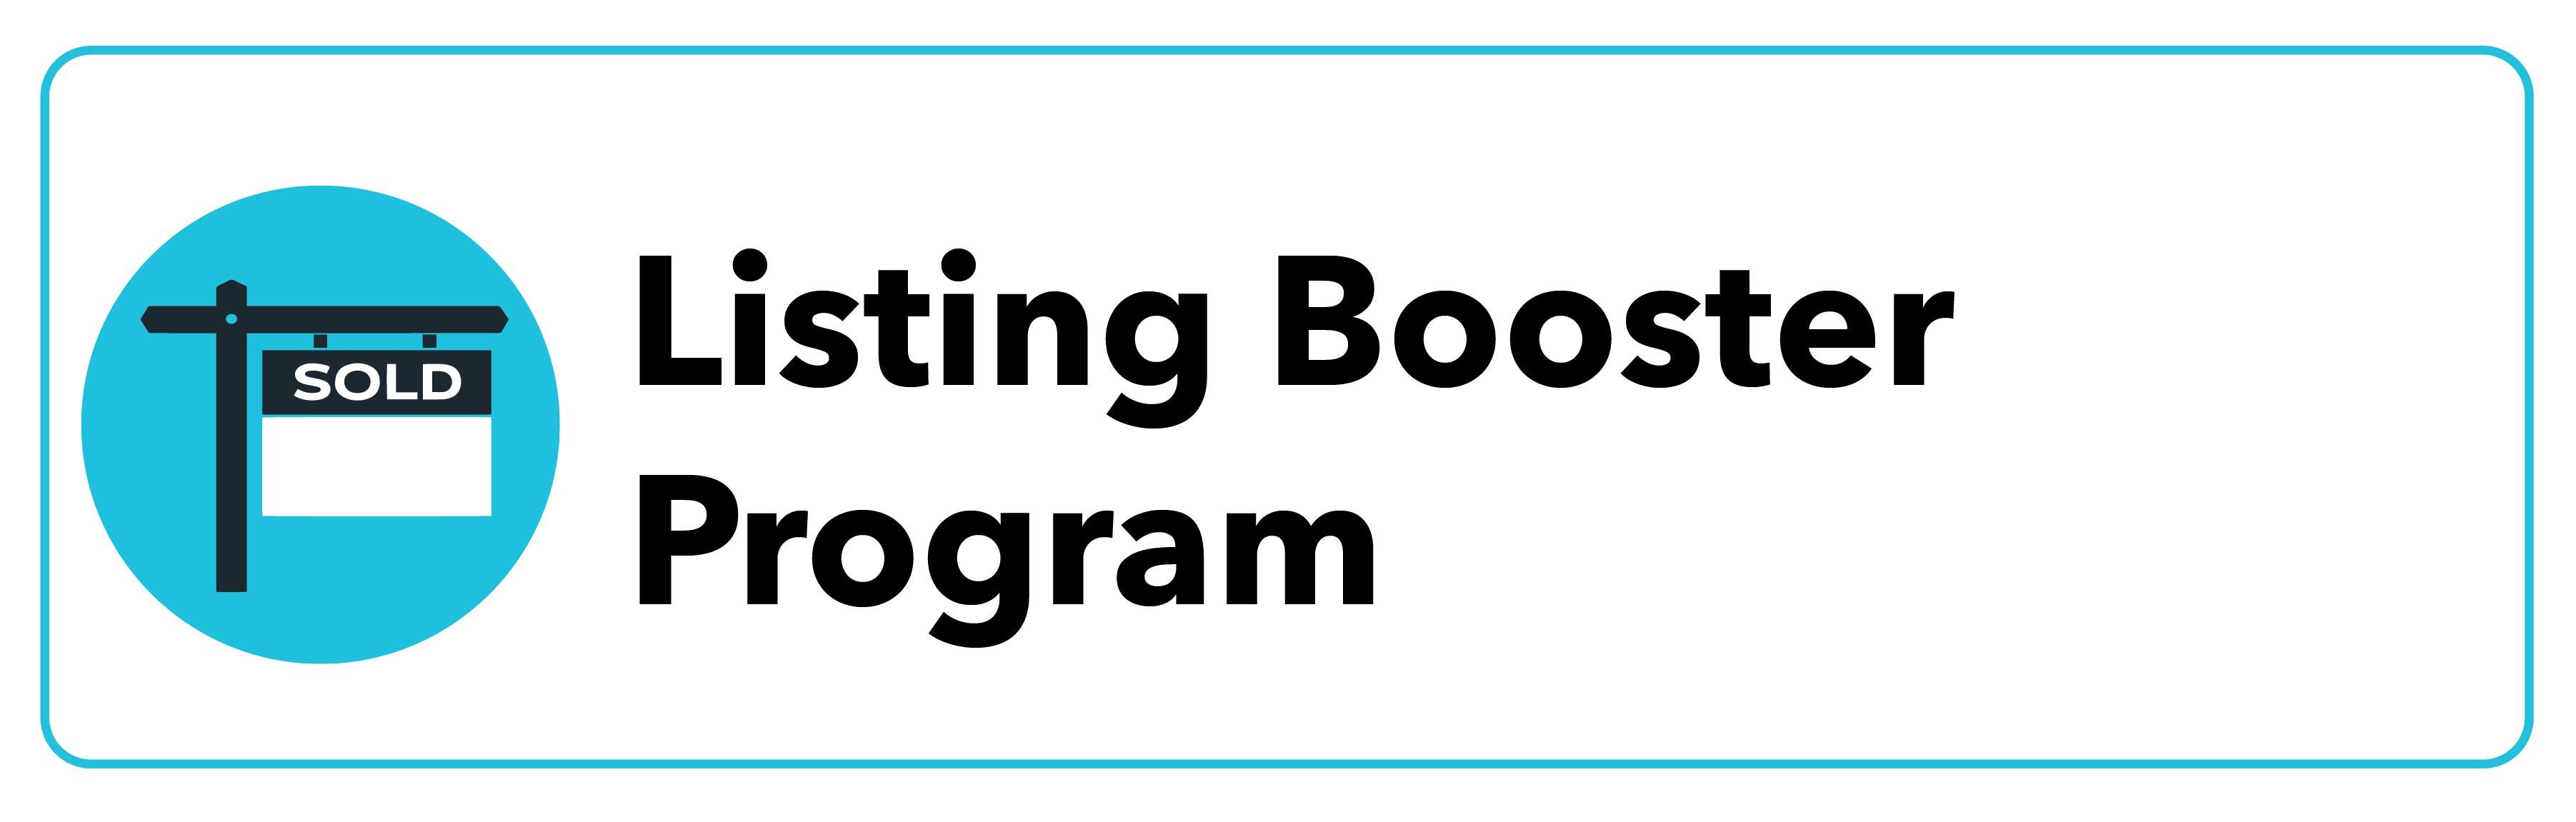 Listing Booster Program